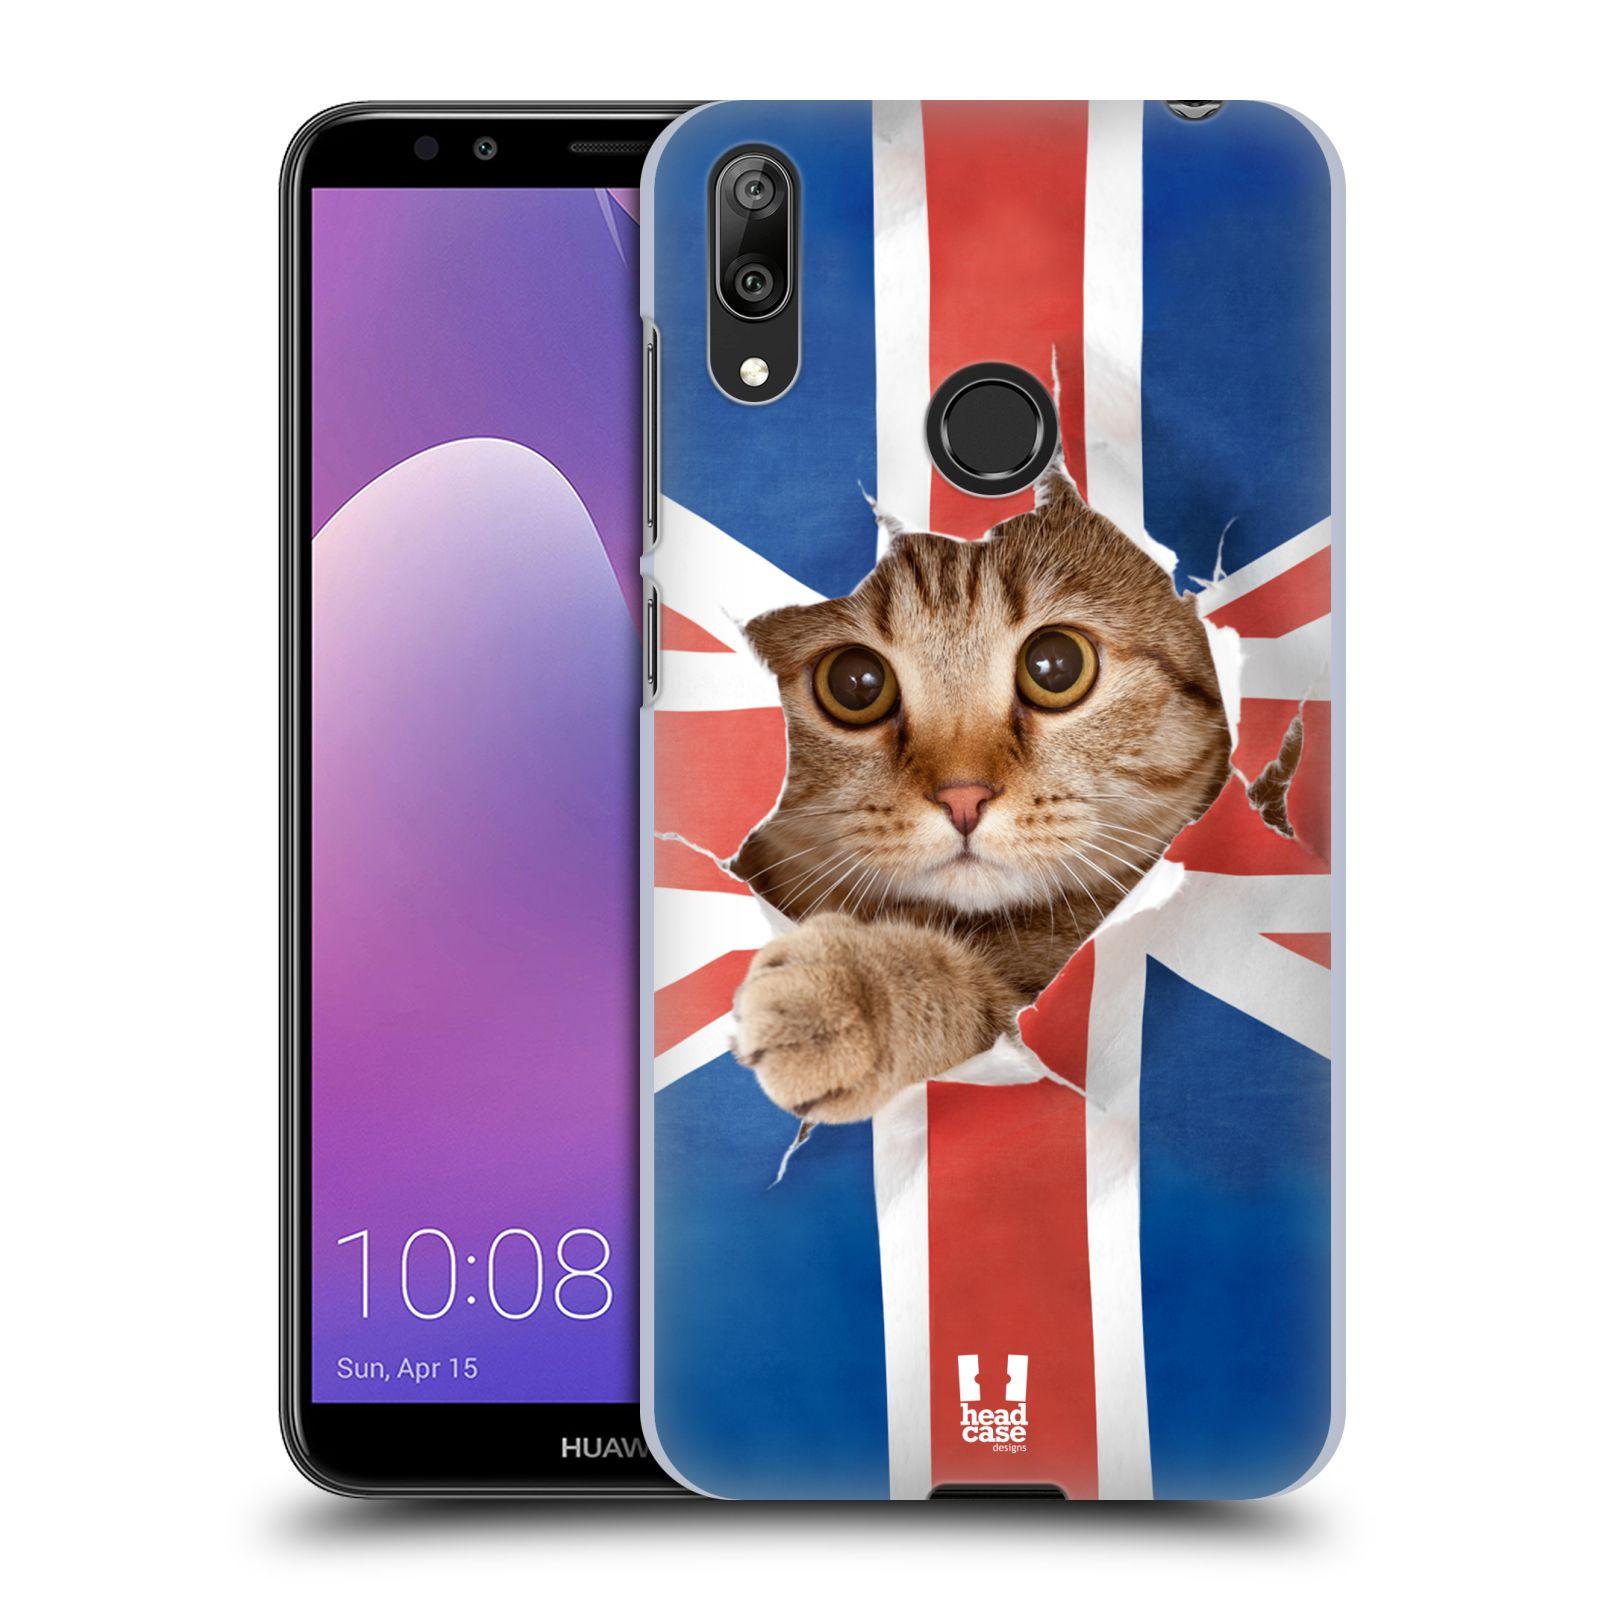 Plastové pouzdro na mobil Huawei Y7 (2019) - Head Case - KOČKA A VLAJKA